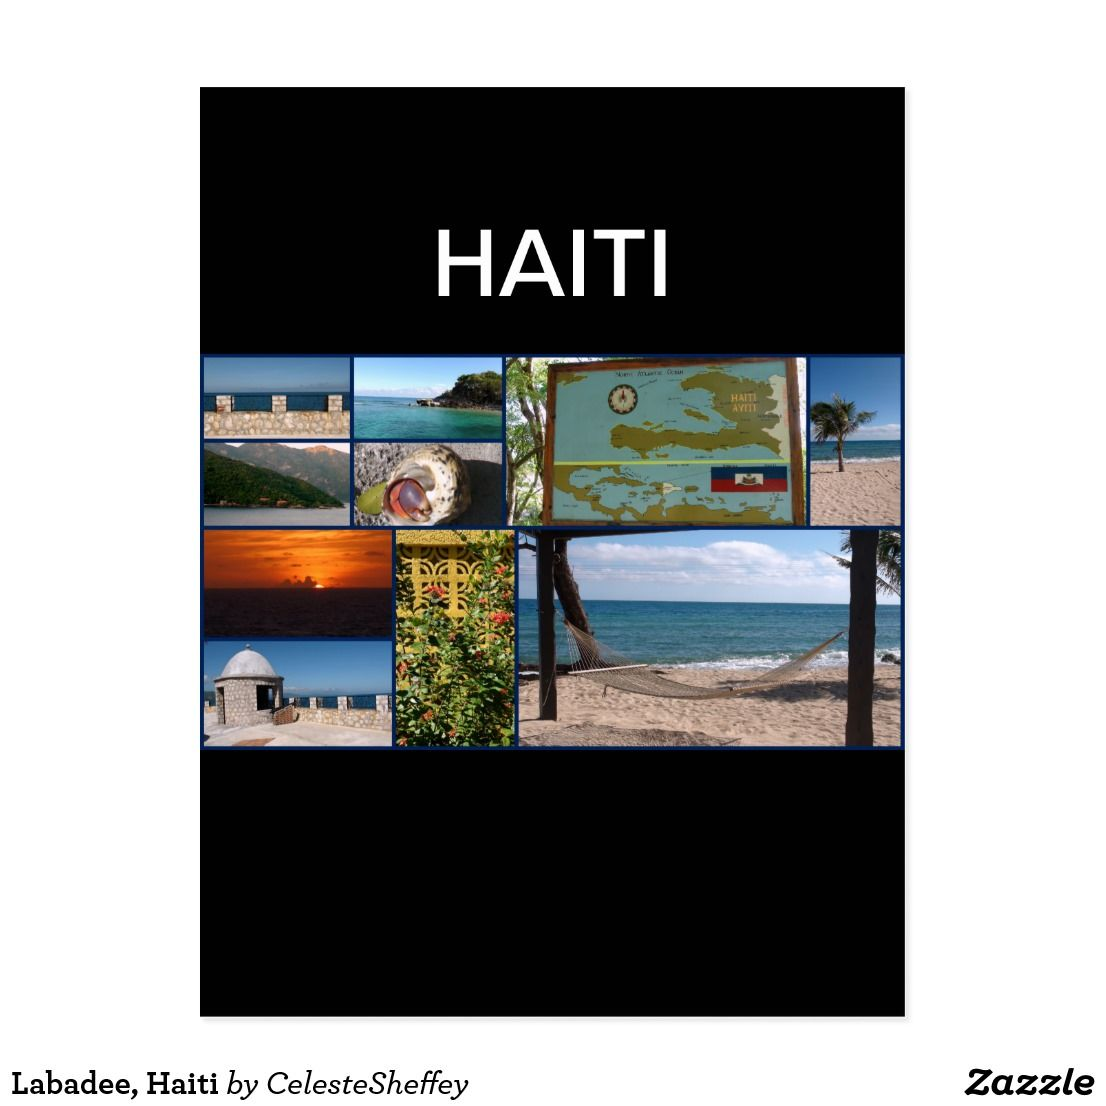 Labadee, Haiti Postcard (sold in PA) Thank you!